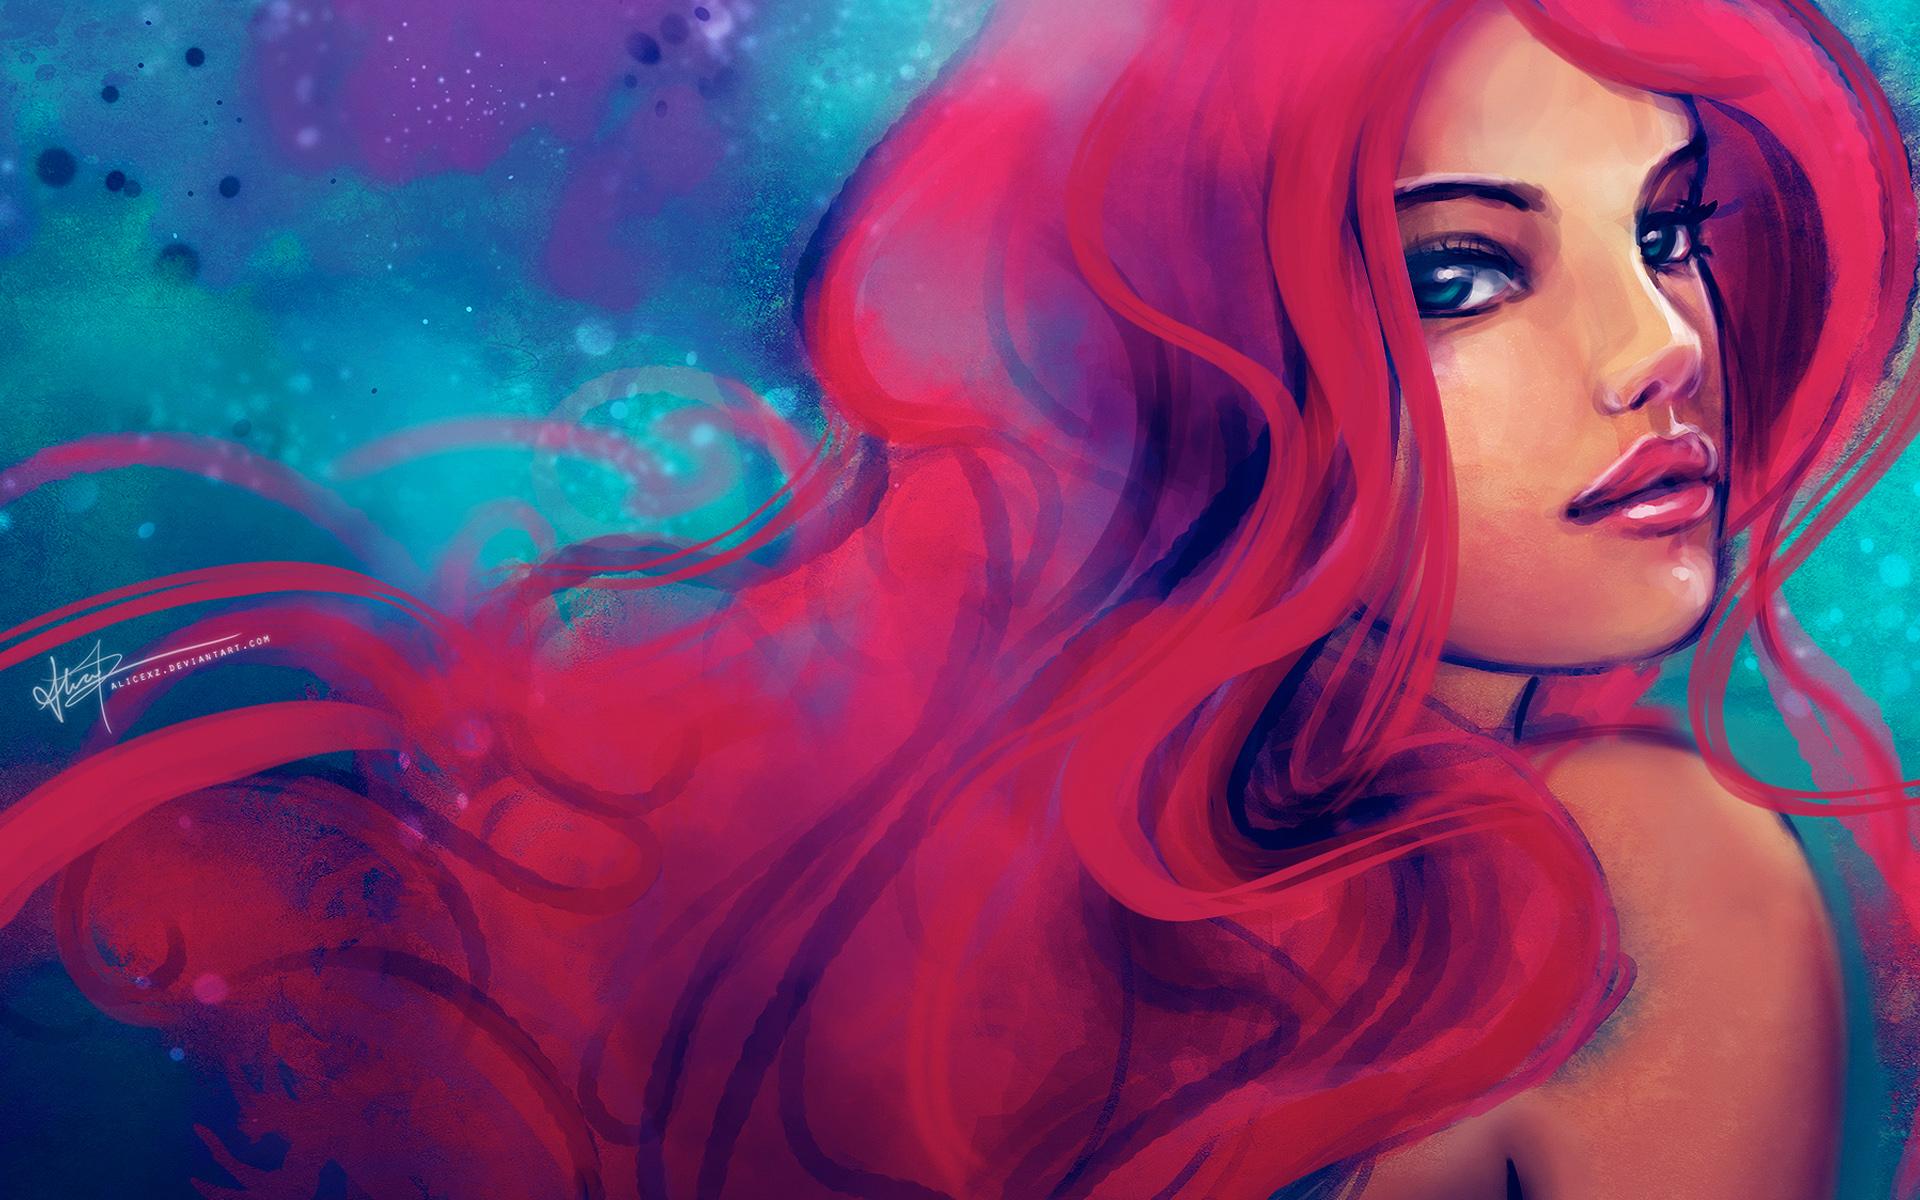 [48+] The Little Mermaid Wallpaper Desktop on WallpaperSafari